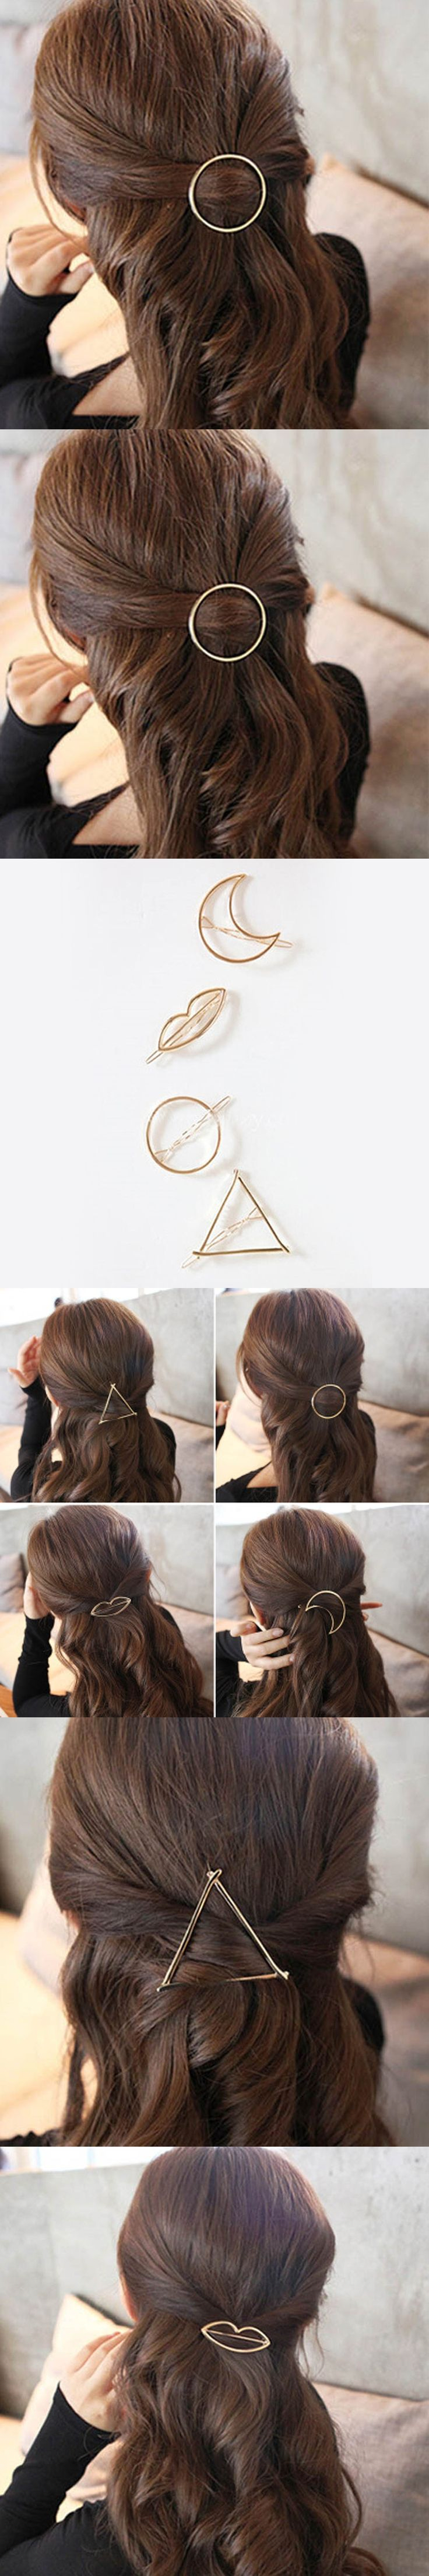 2017 New Brand Hairpins Triangle Moon Hair Pin Jewelry Lip Round Hair Clip For Women Barrettes Head Accessories Bijoux De Tete